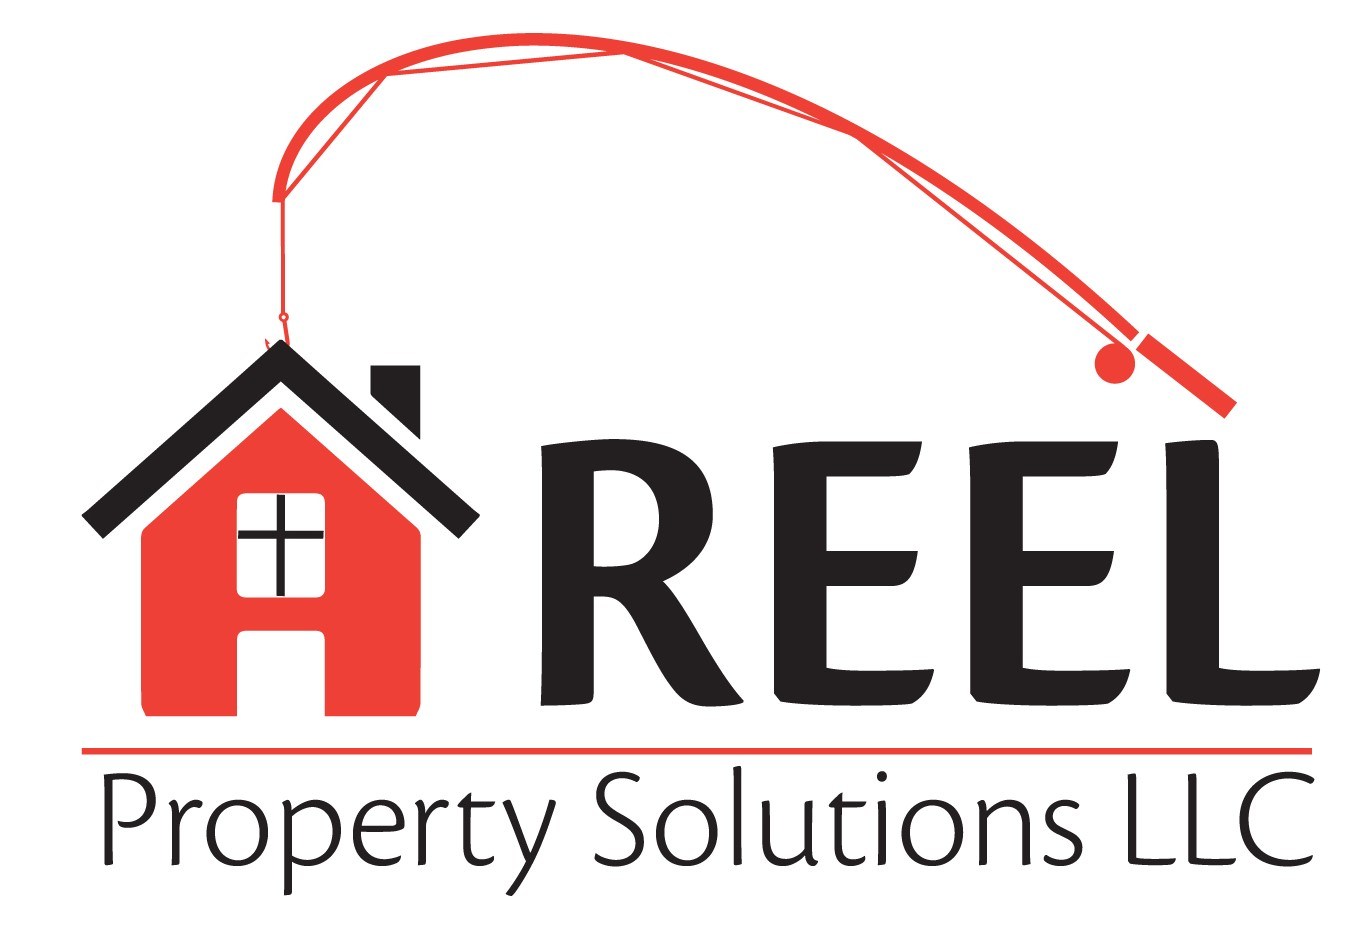 Reel Property Solutions LLC